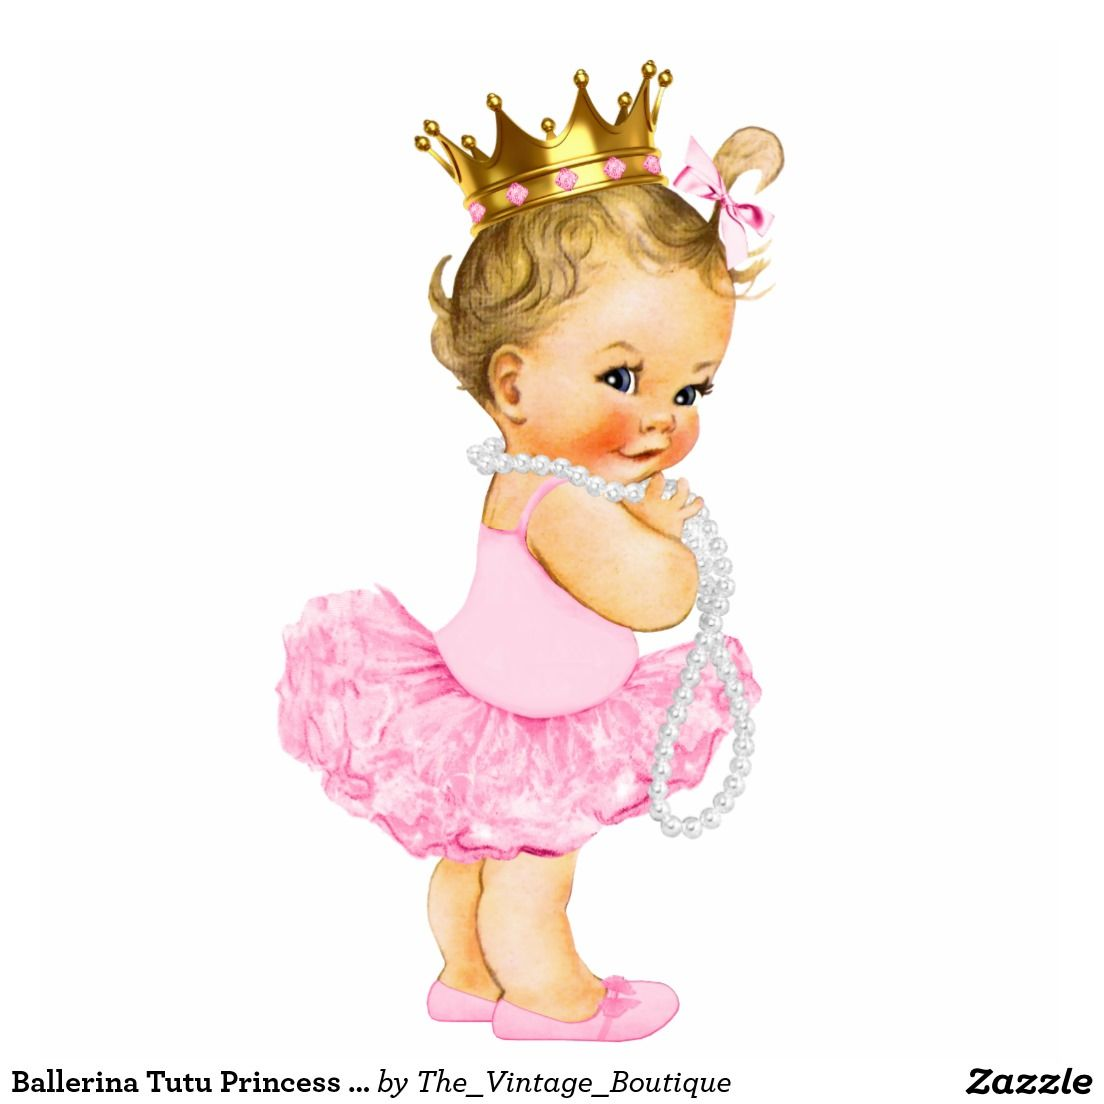 Tutu princess girl statuette. Ballerina clipart baby shower